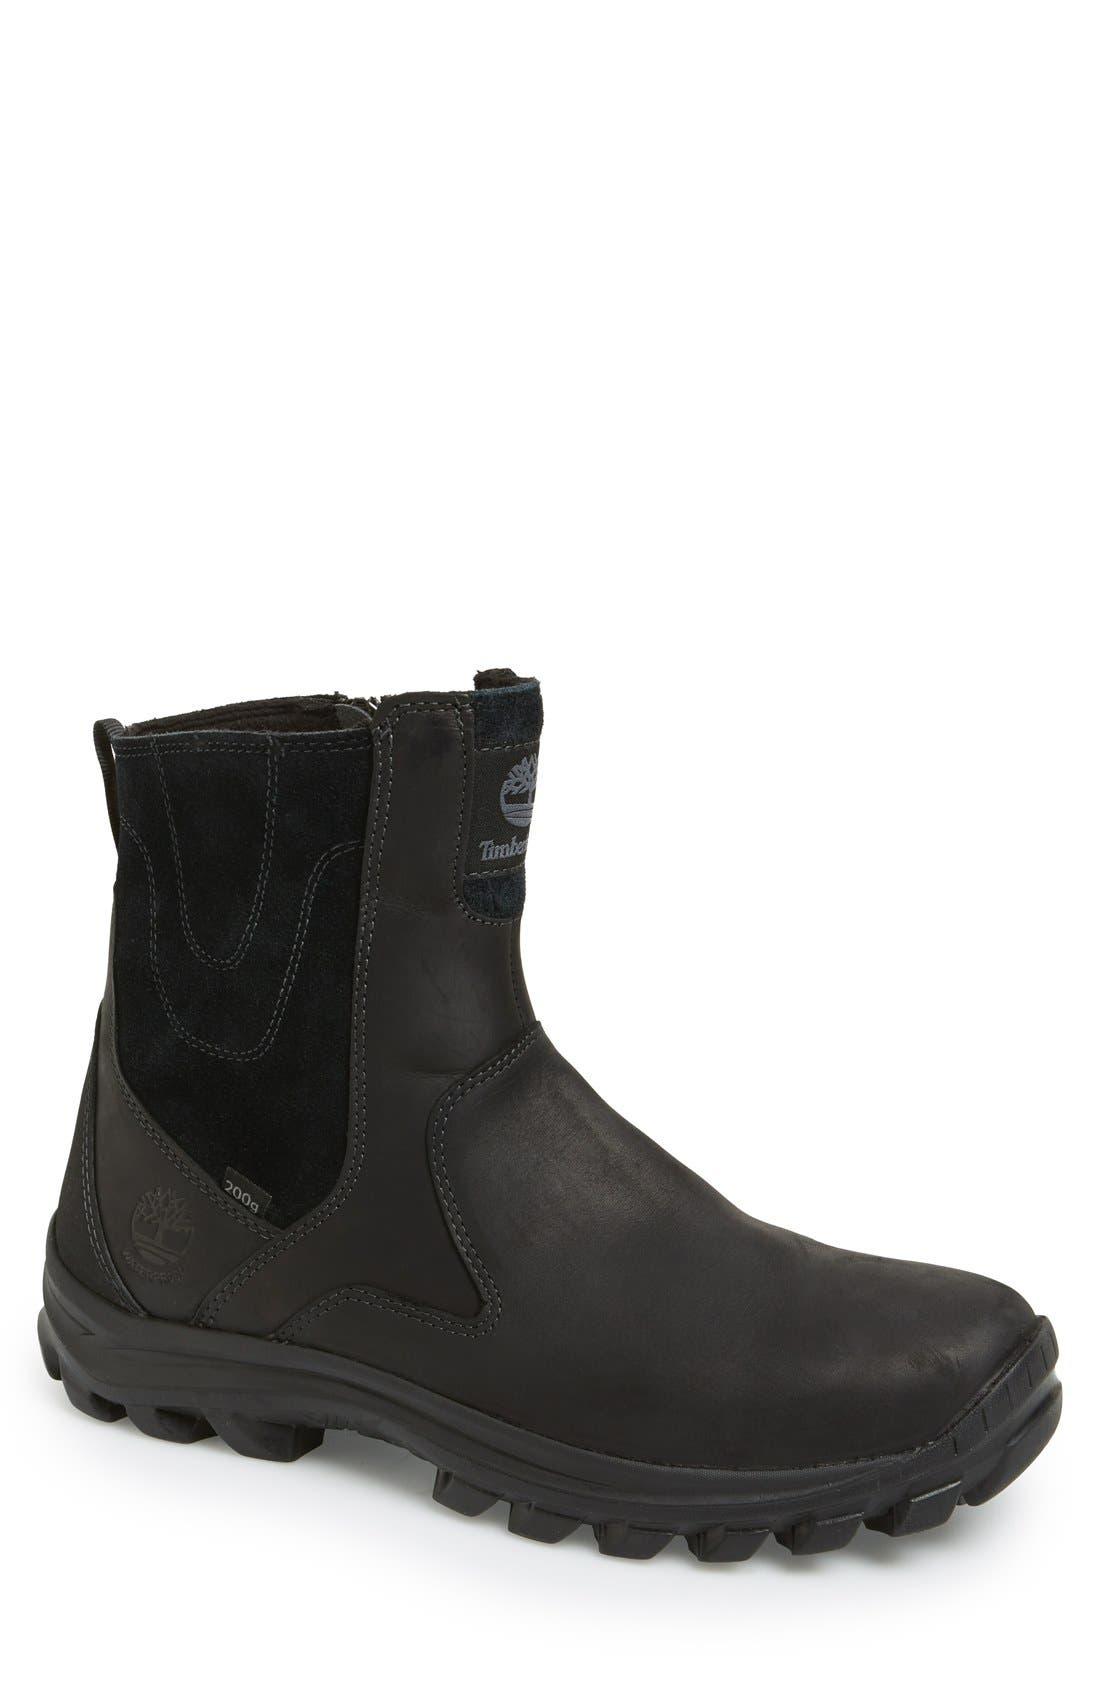 TIMBERLAND ChillbergWaterproof Boot